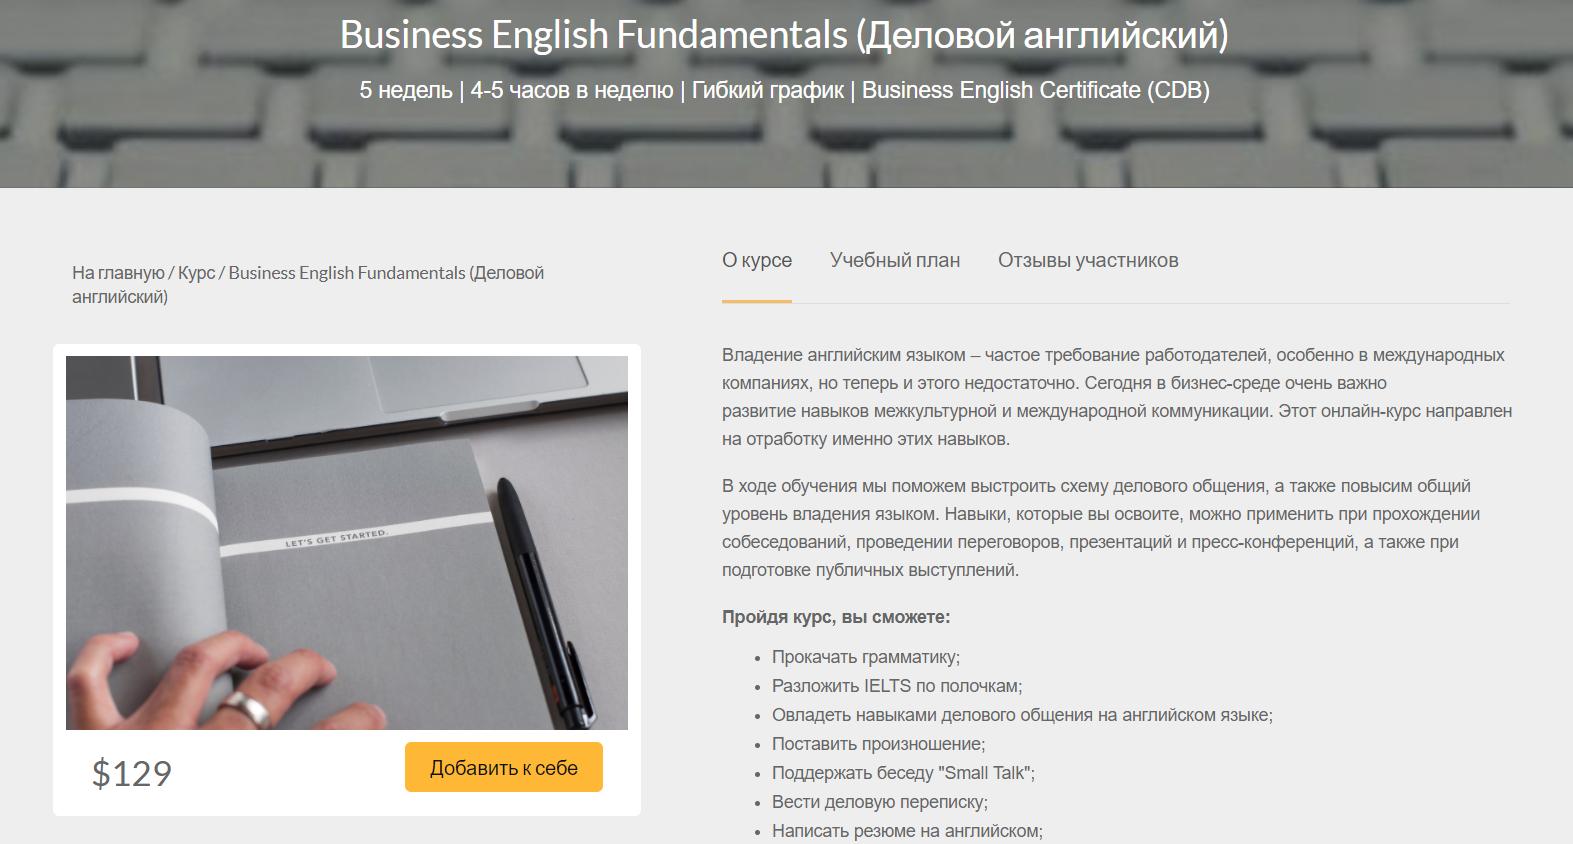 Business English Fundamentals (Деловой английский) [CBD IELTS.Hub] [Надежда Зима] 0.png